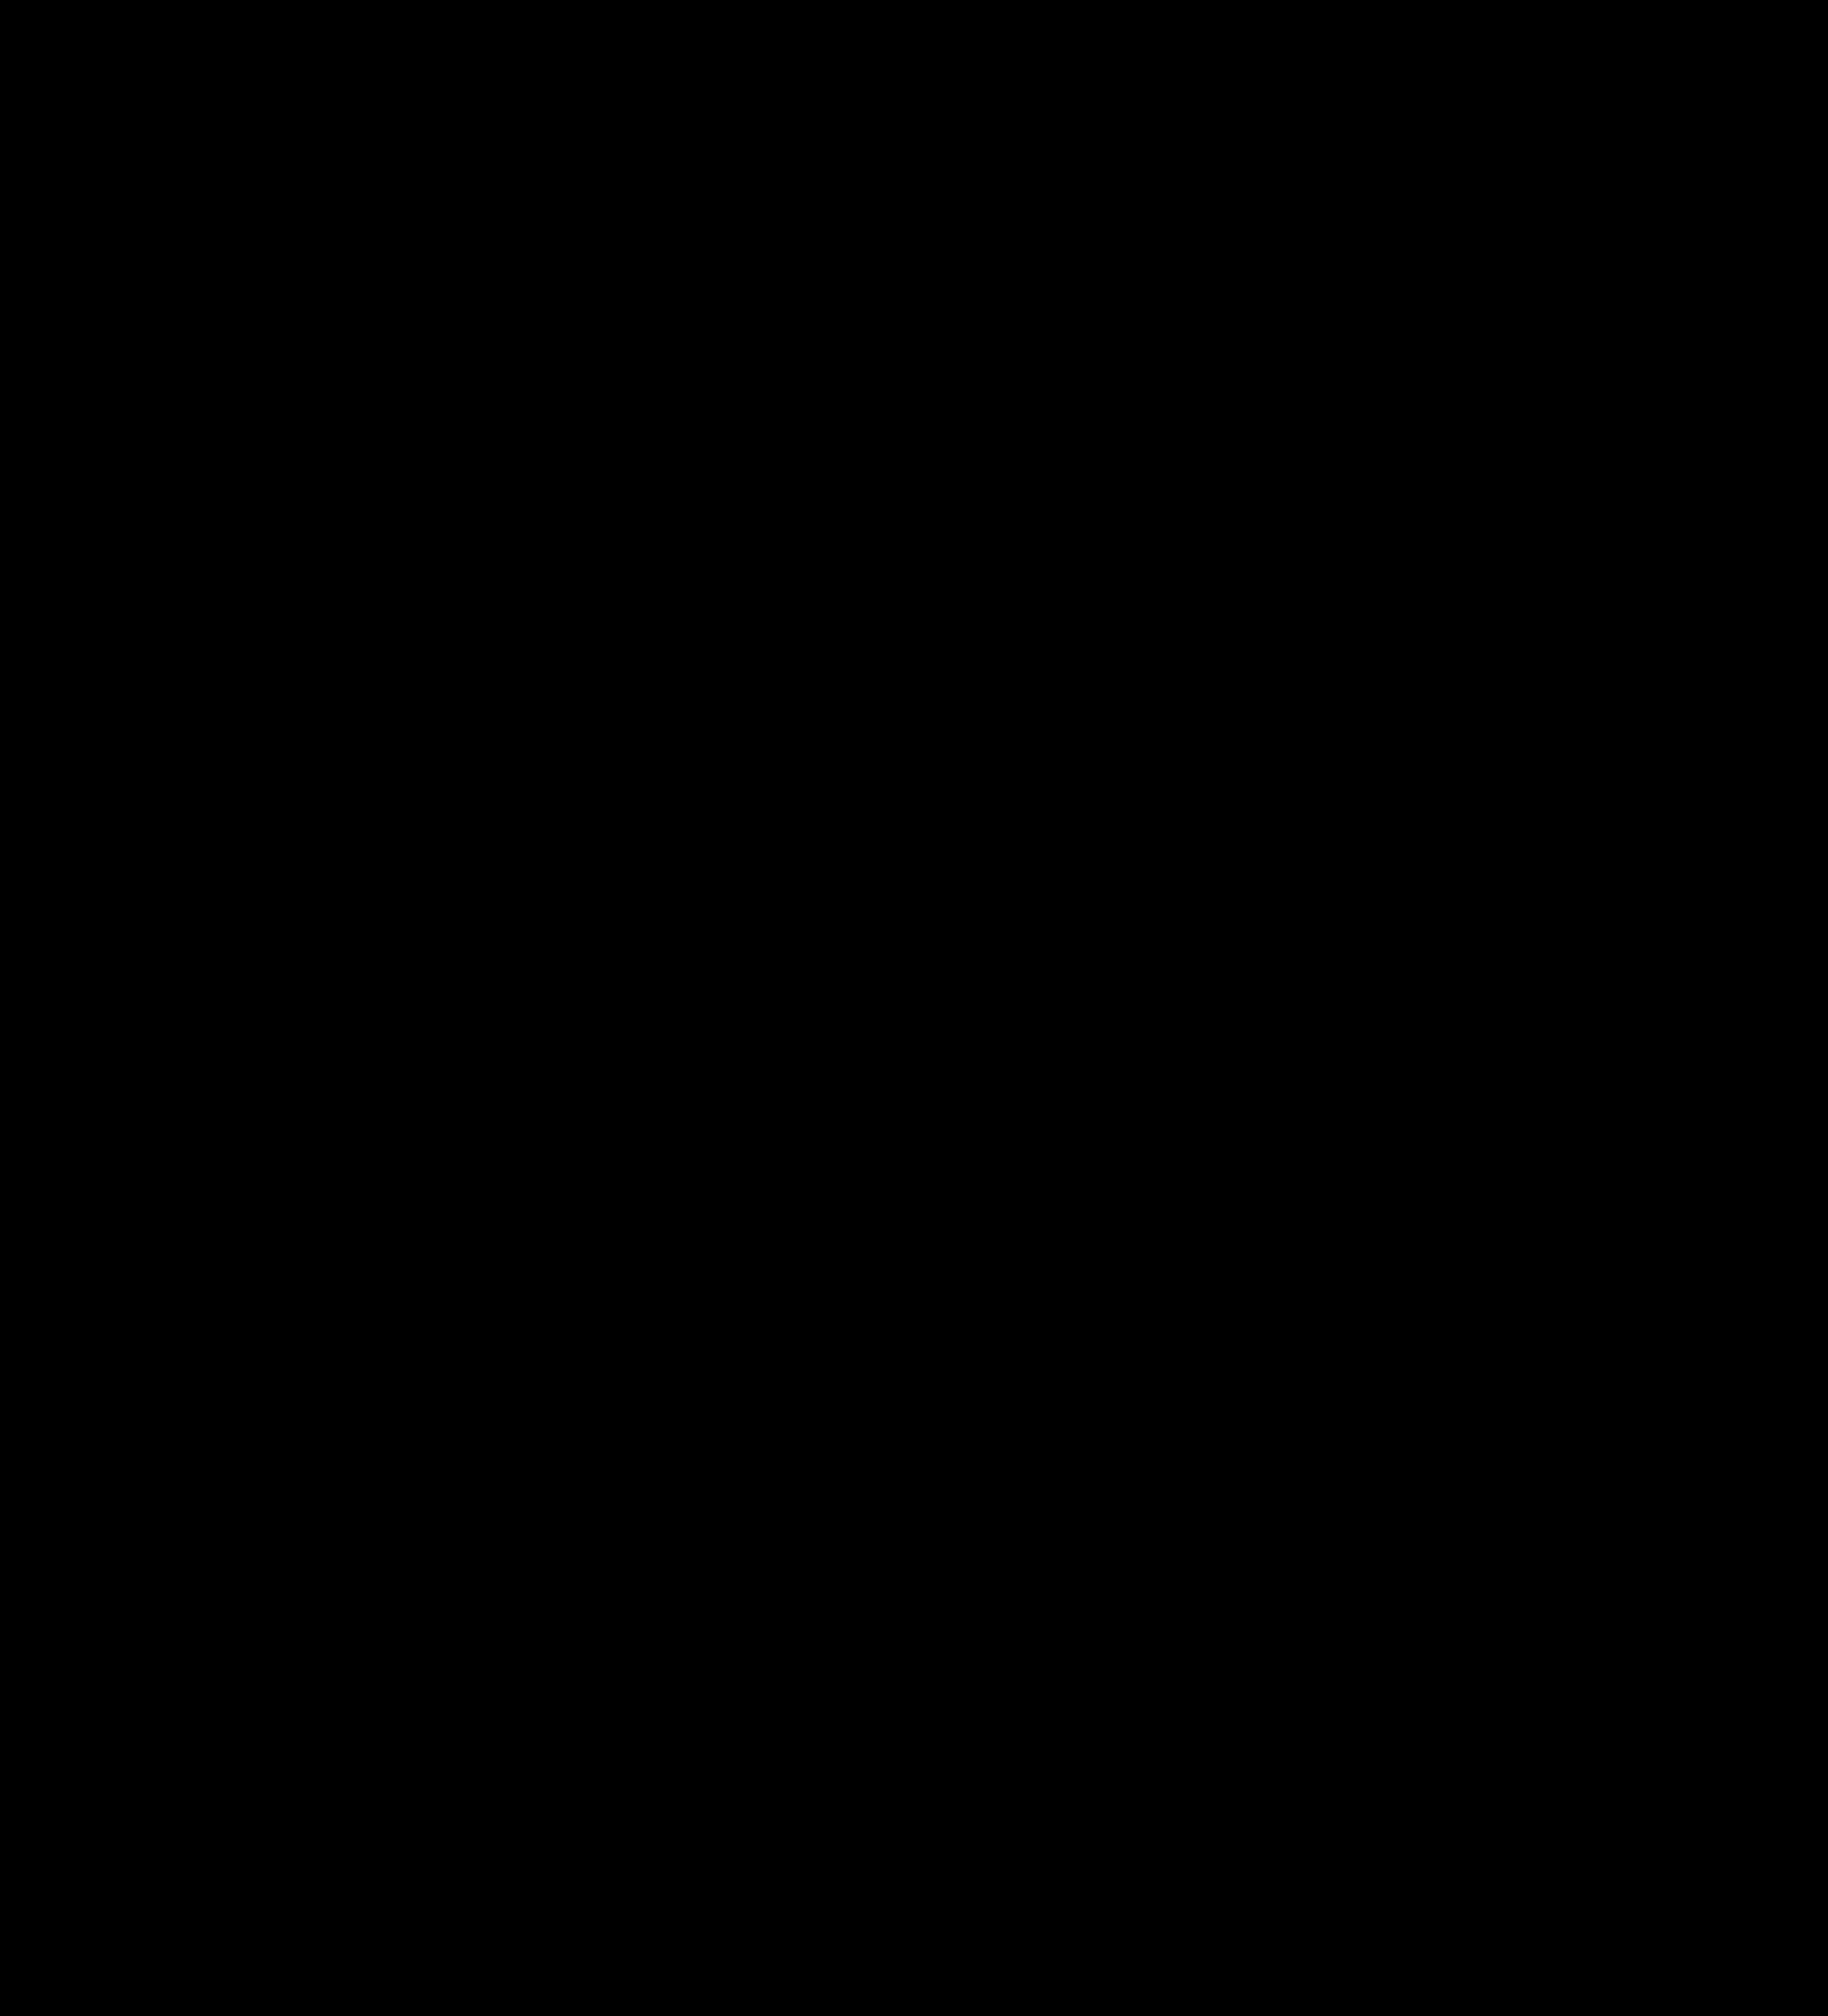 Human clipart human head. Man silhouette big image